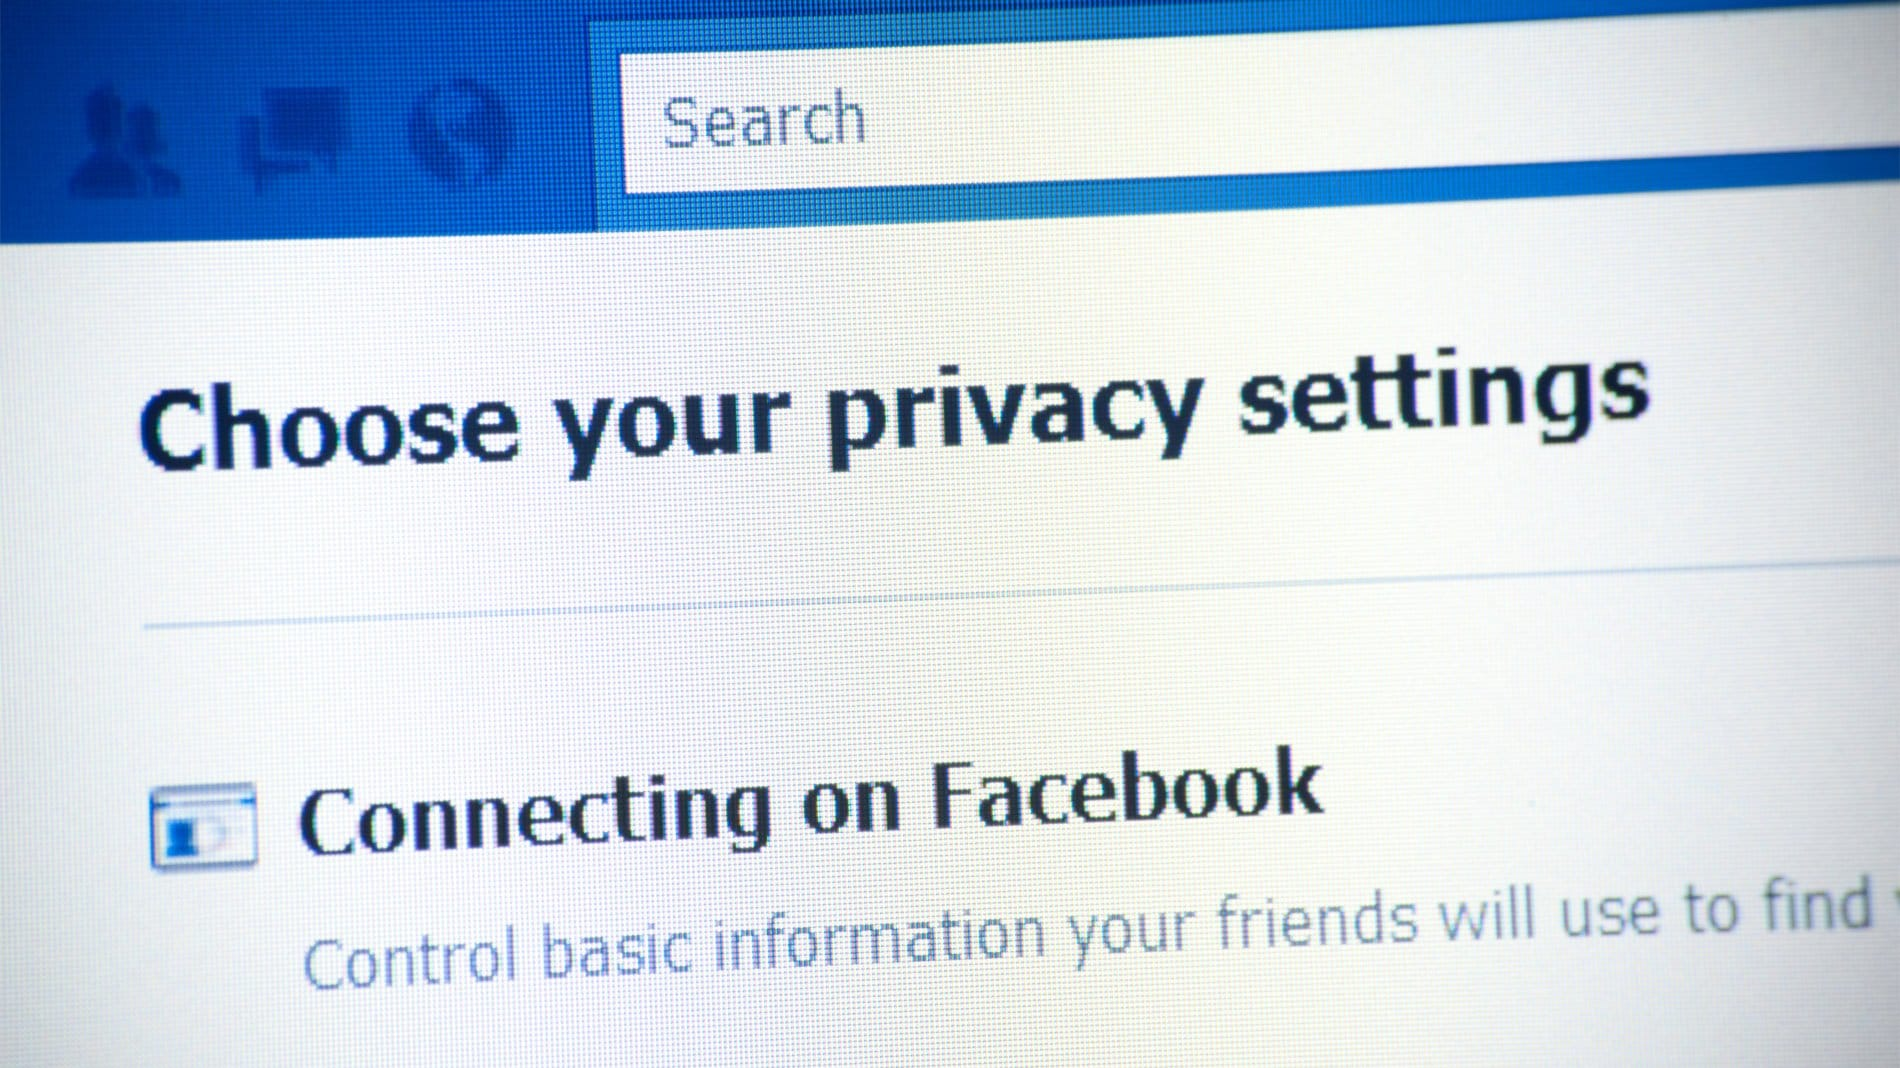 Privacysettings